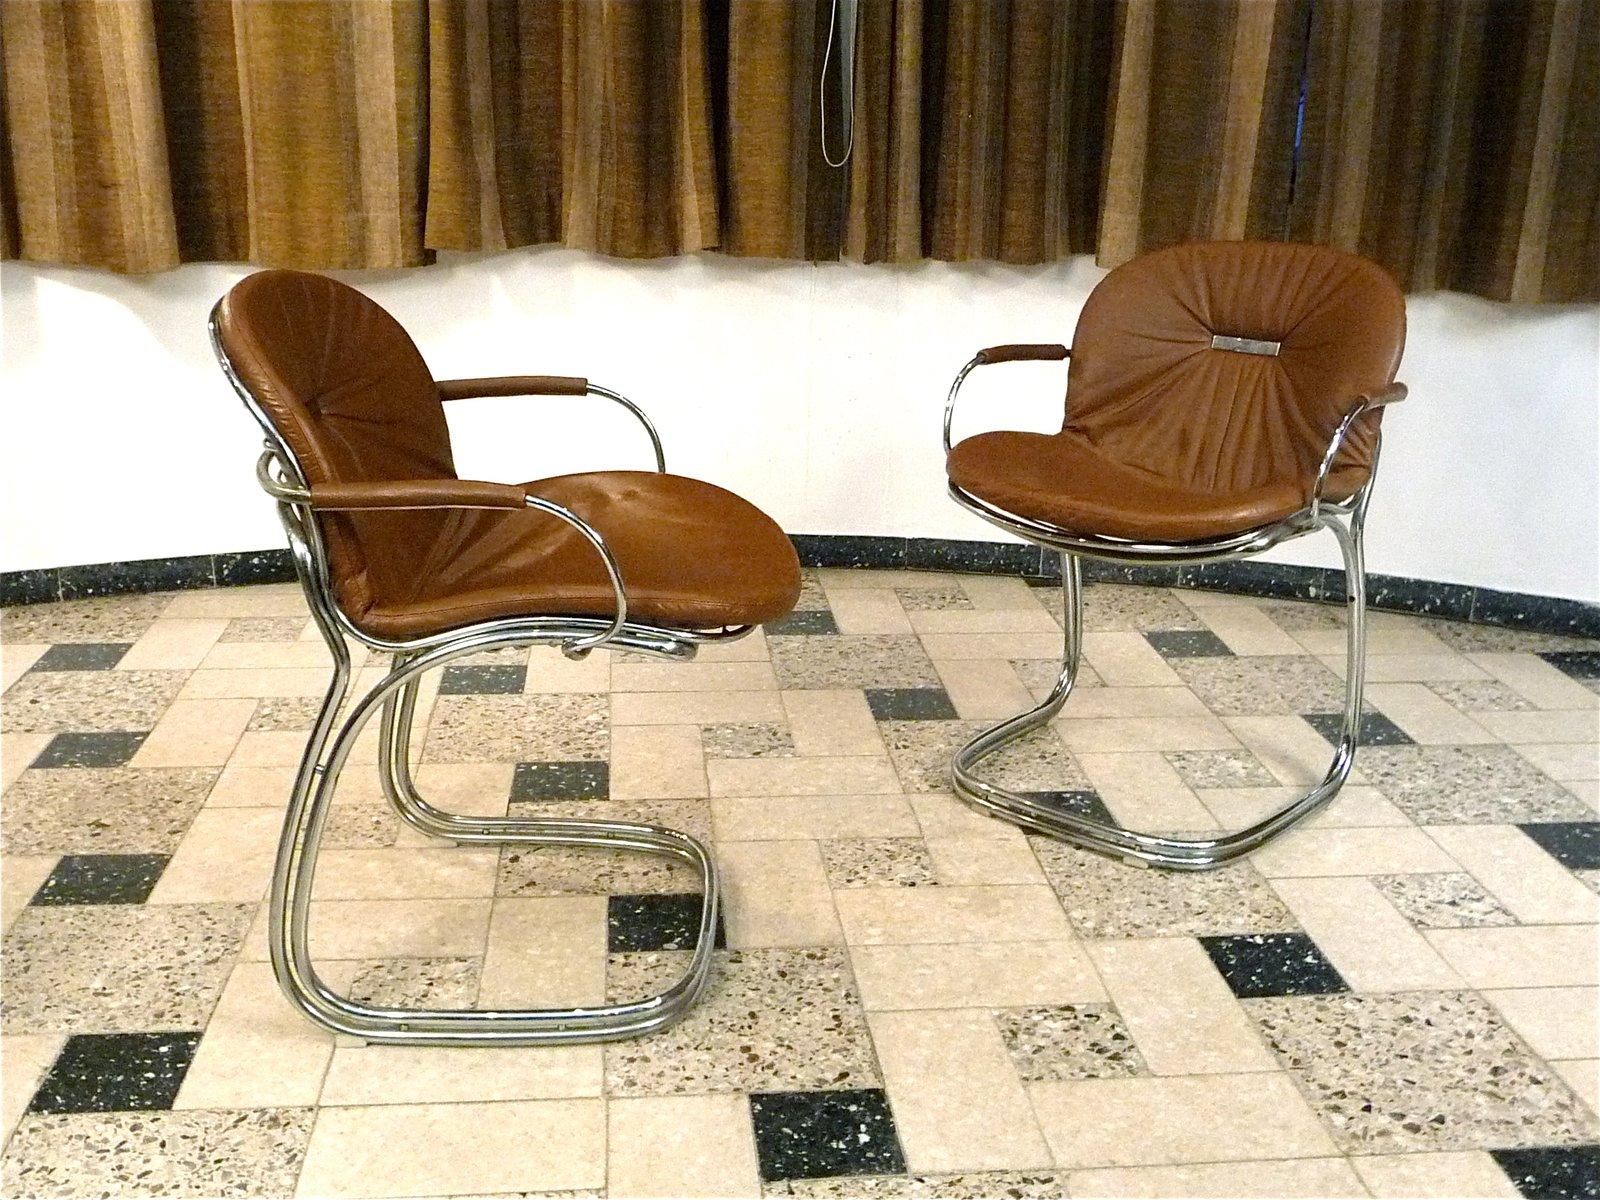 sabrina leder esszimmer st hle von gastone rinaldi f r rima 1970er 6er set bei pamono kaufen. Black Bedroom Furniture Sets. Home Design Ideas